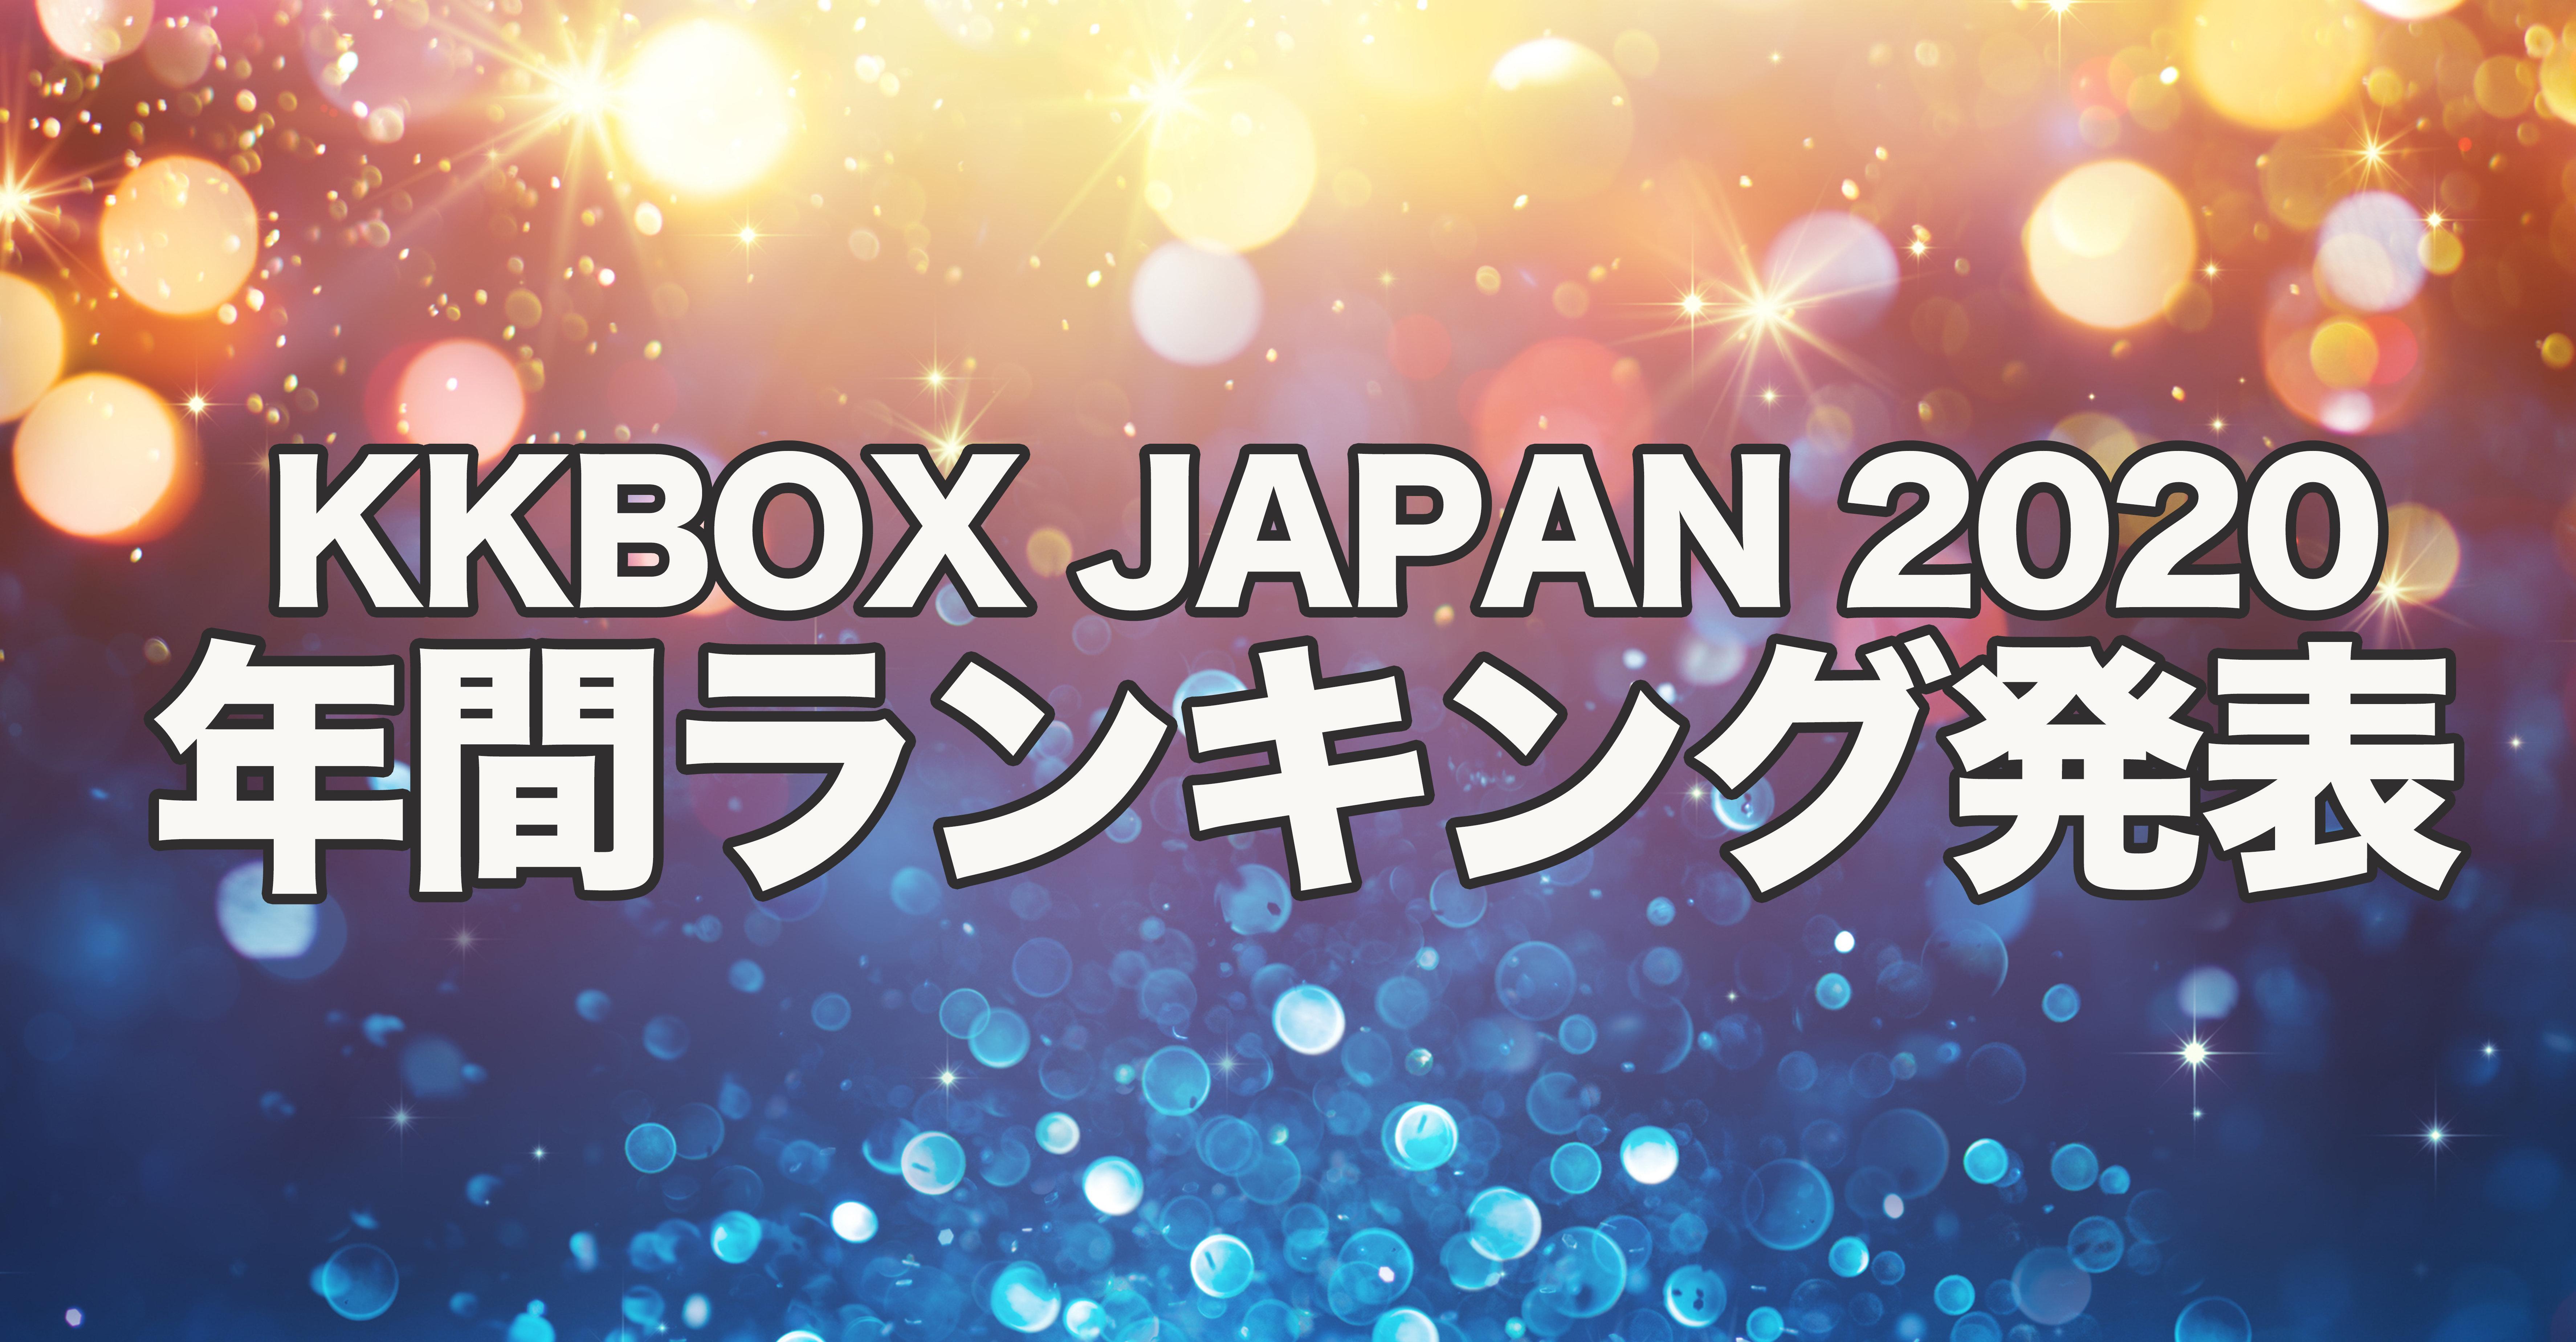 KKBOX JAPAN 2020 年間ランキング発表